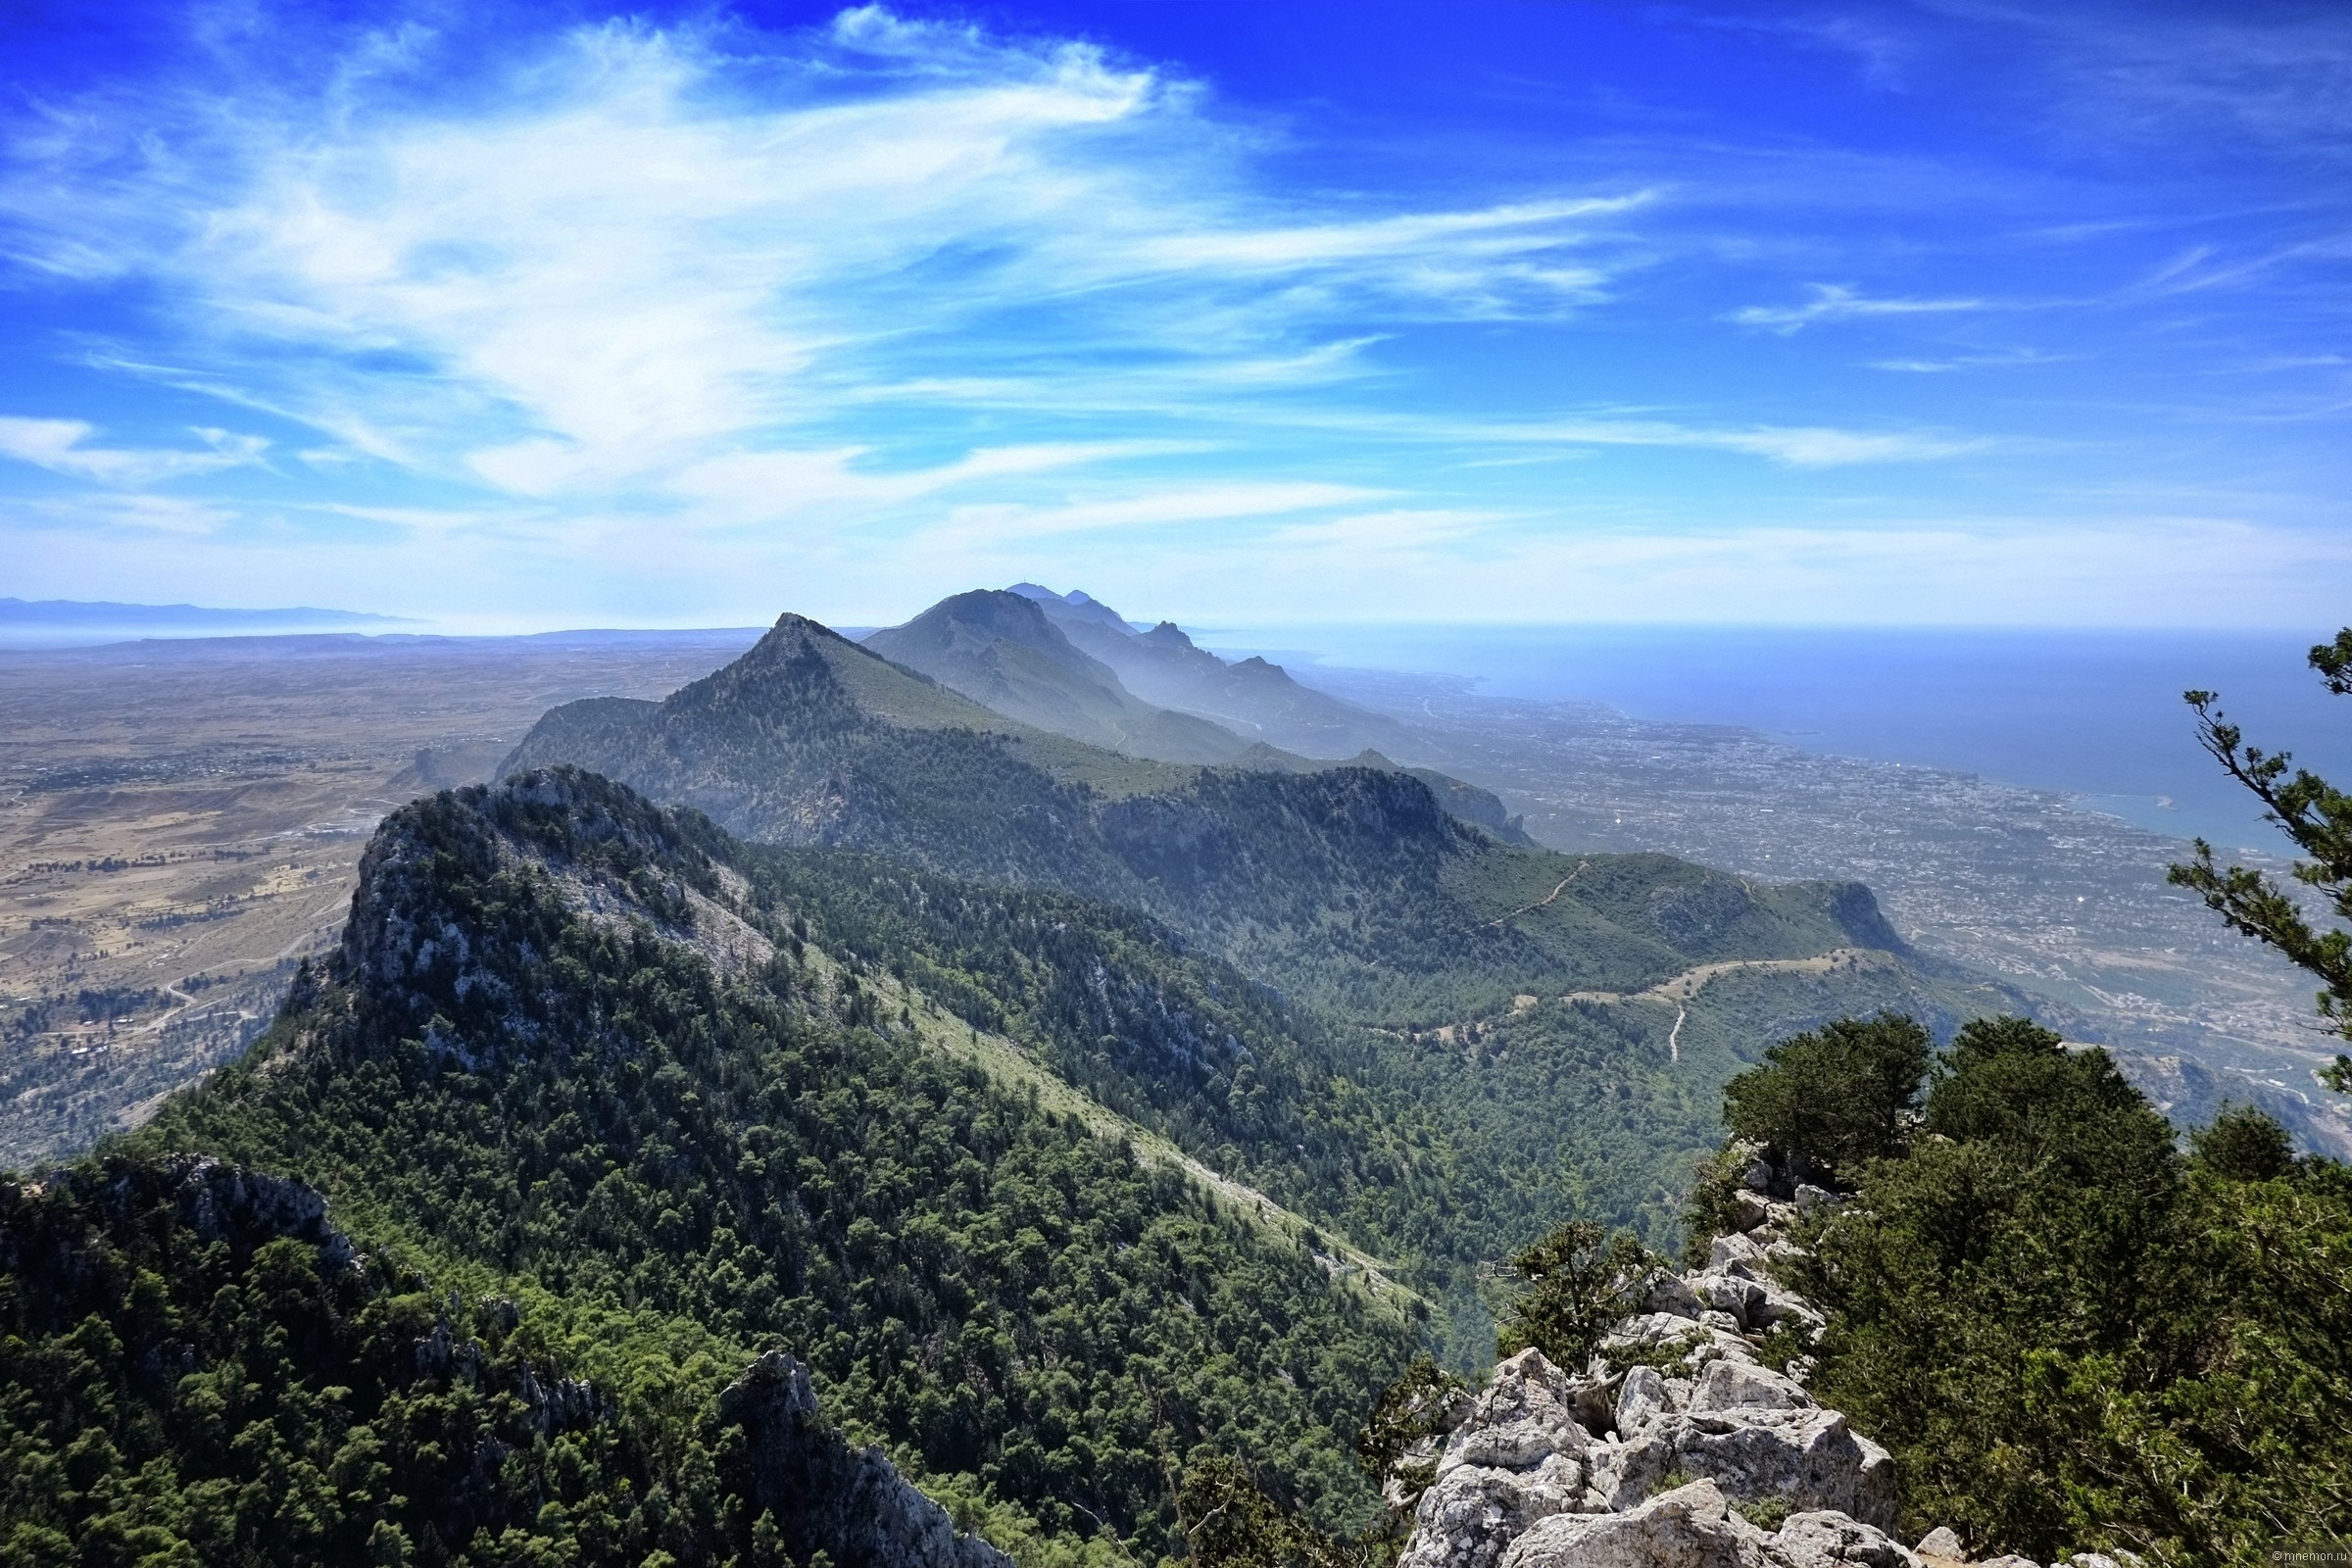 جبال ترودوس